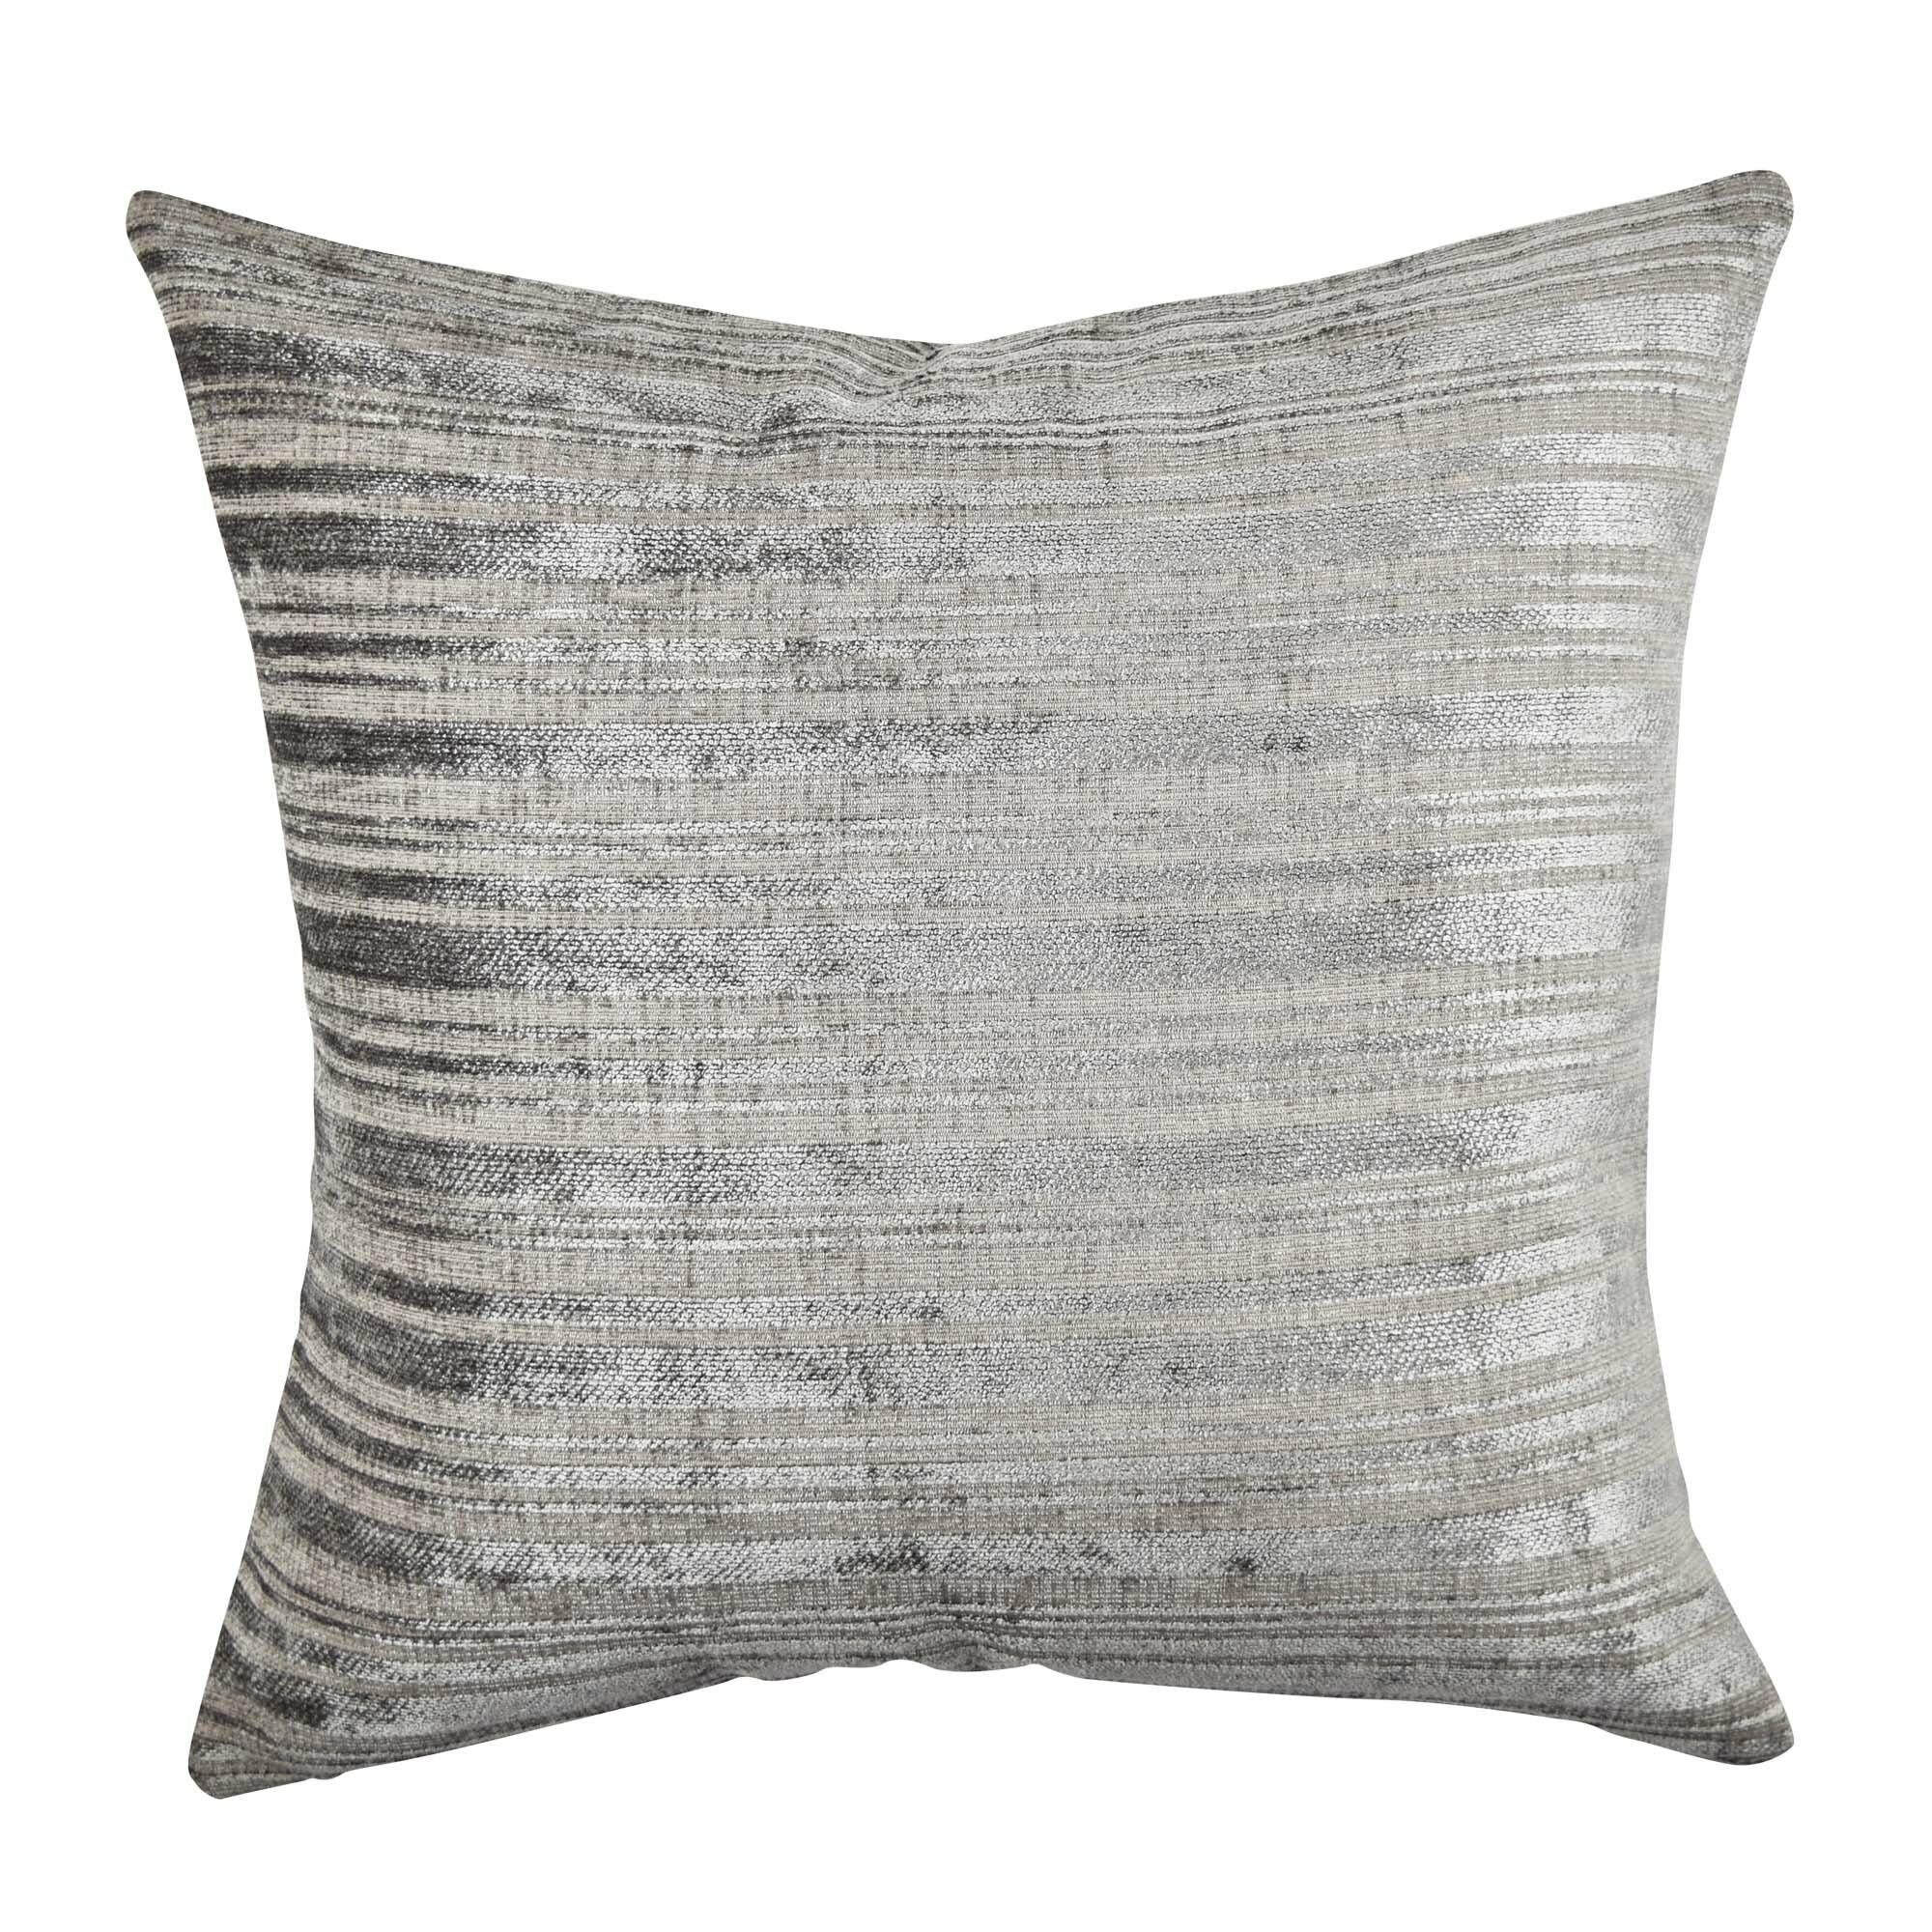 Vesper lane stripe designer fabric throw pillow wayfair - Fabric for throw pillows ...